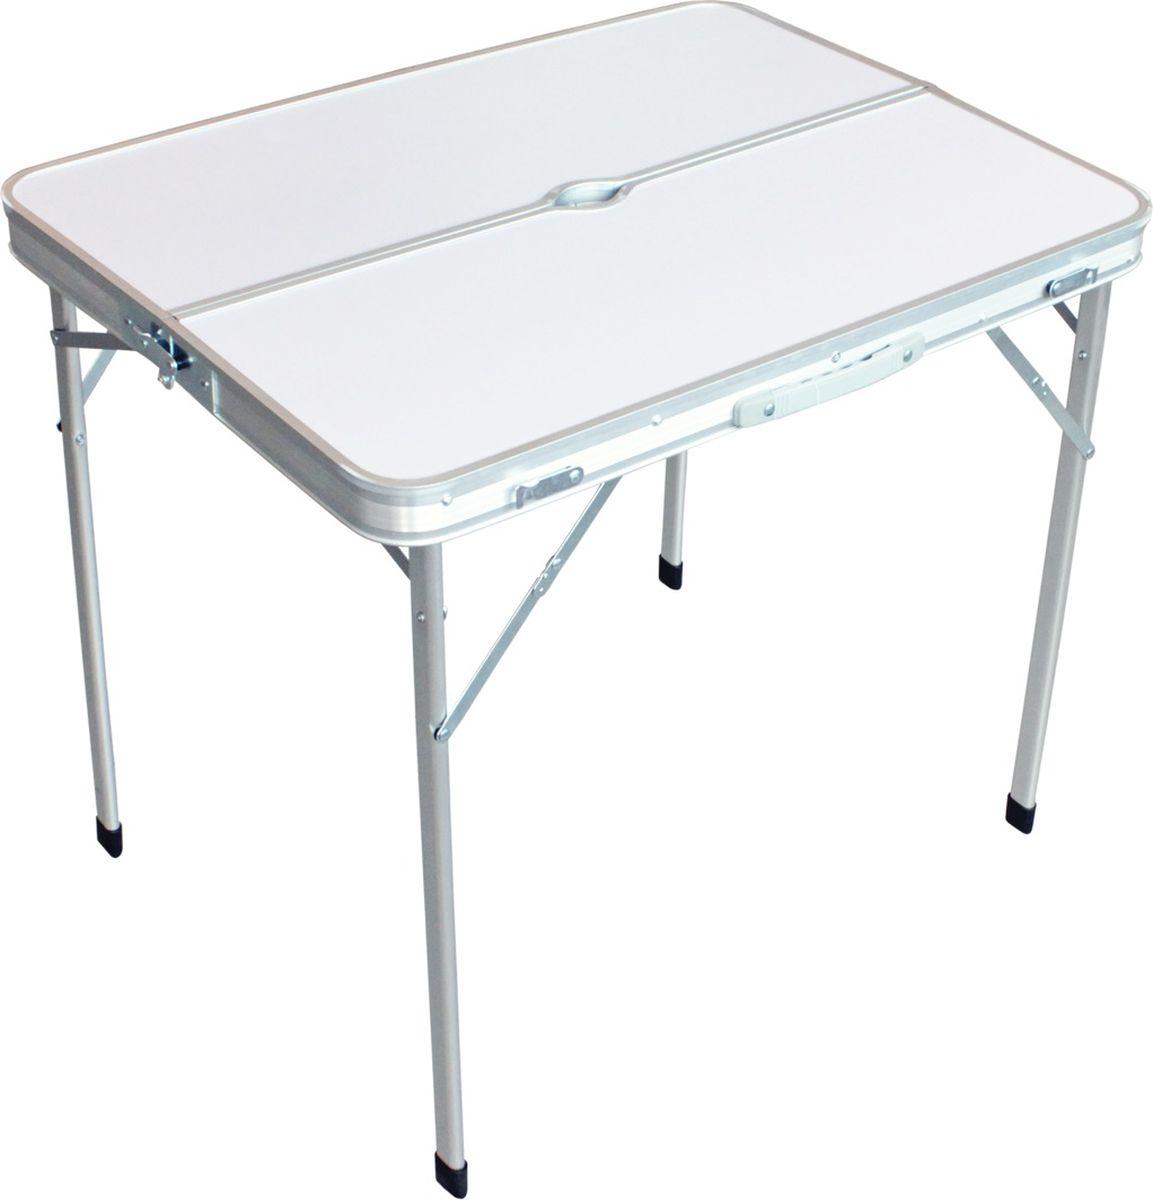 Стол складной Woodland Picnic Table Luxe, цвет: белый, 80 x 60 x 67 см